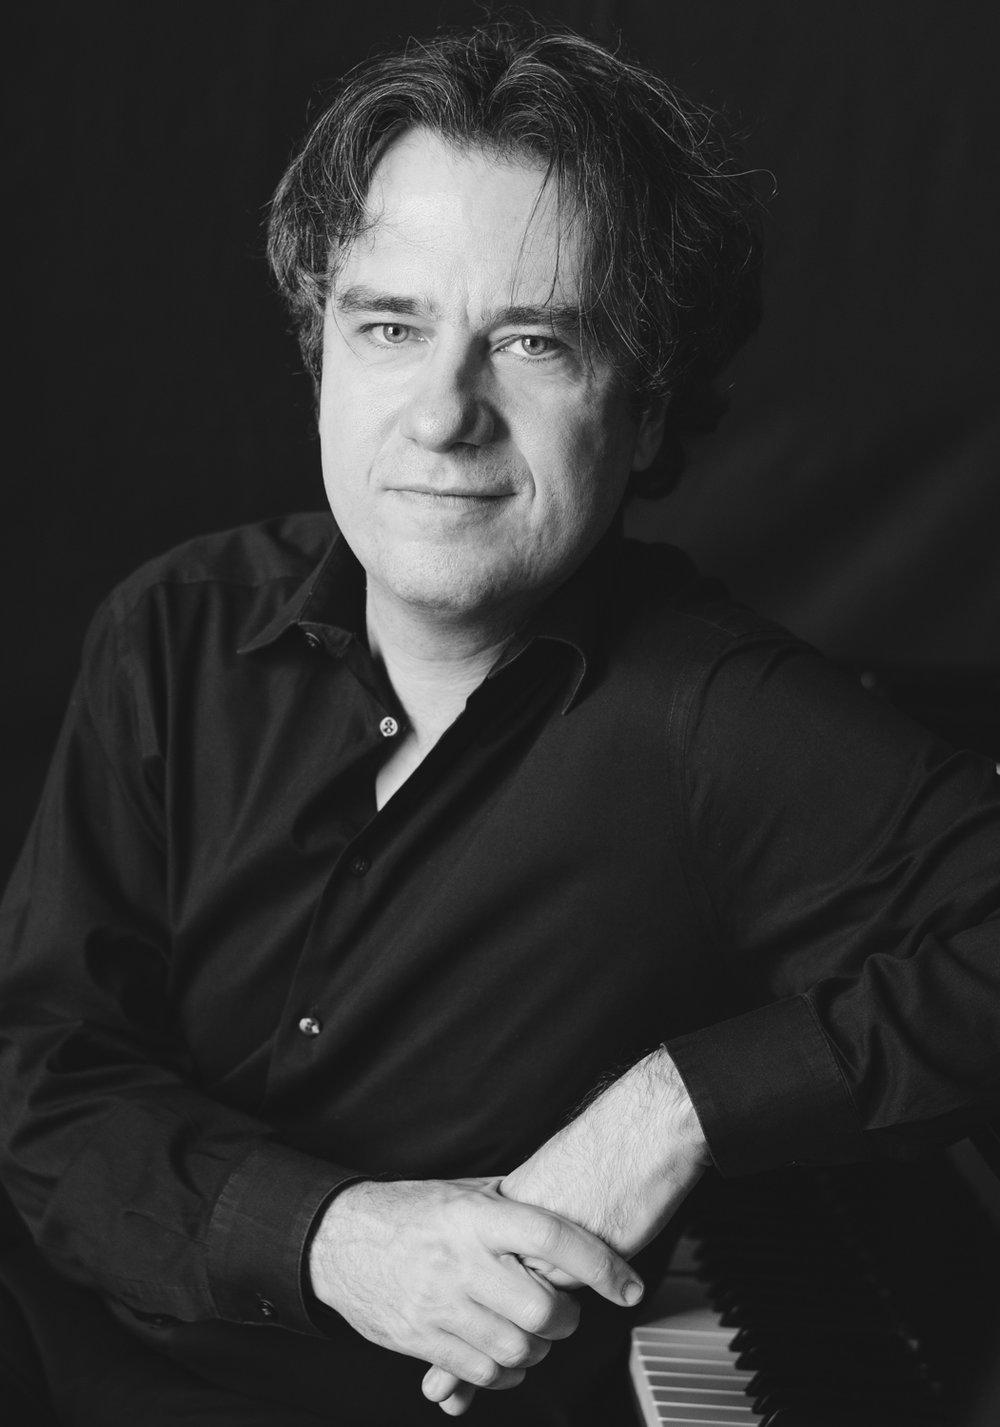 Vladimir Valjarevic, pianist